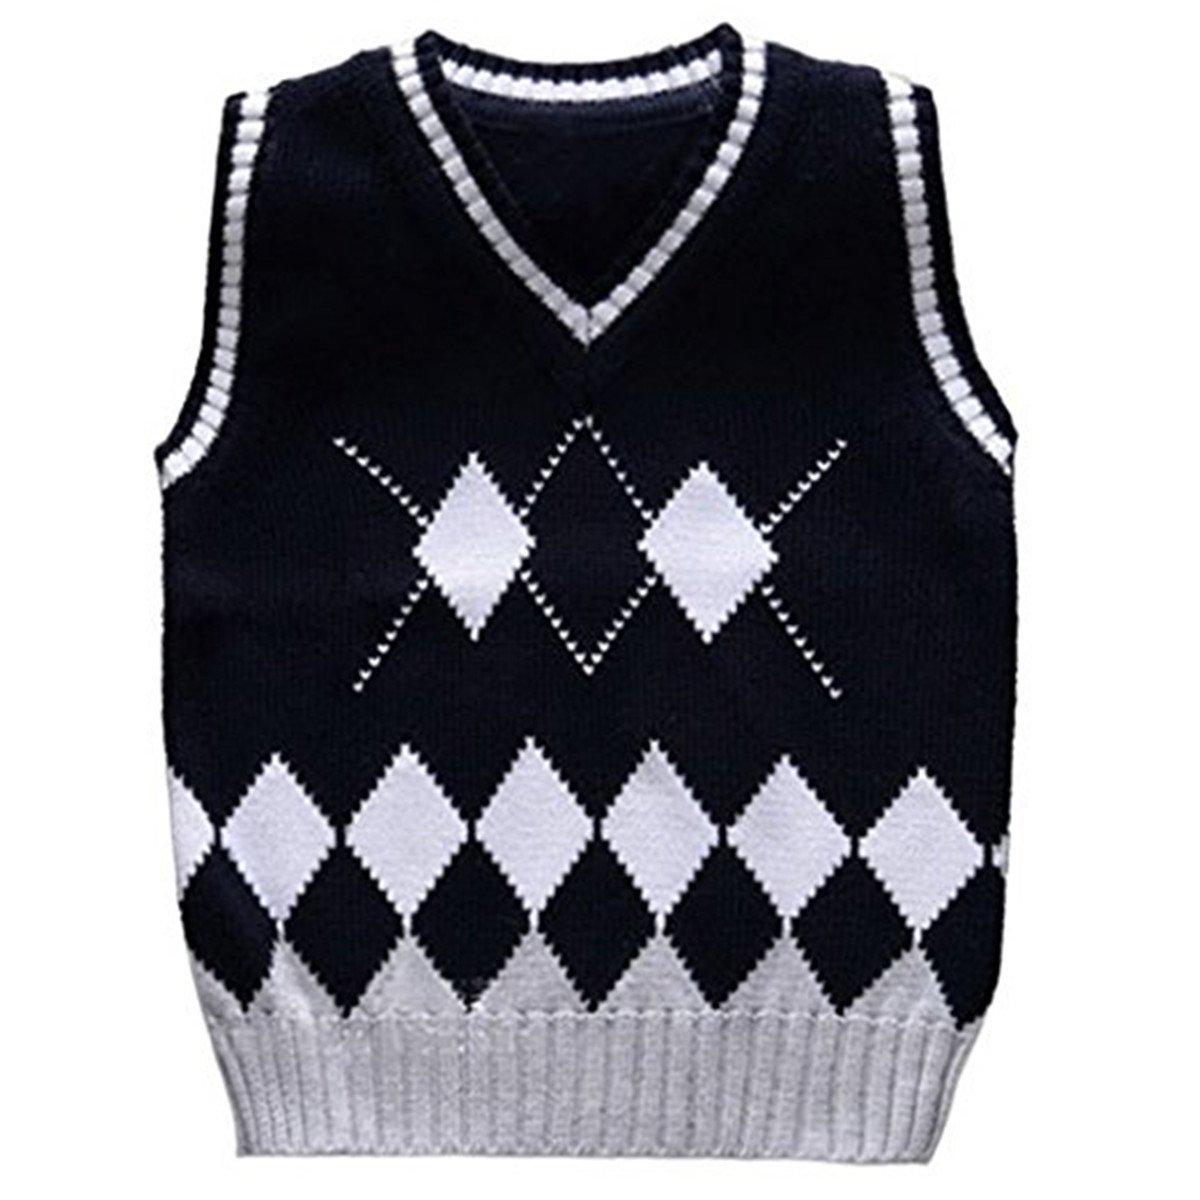 JELEUON Baby Boys Toddler V-Neck Argyle Knit Thicken Students Sweater Vest CSsNPLI1005